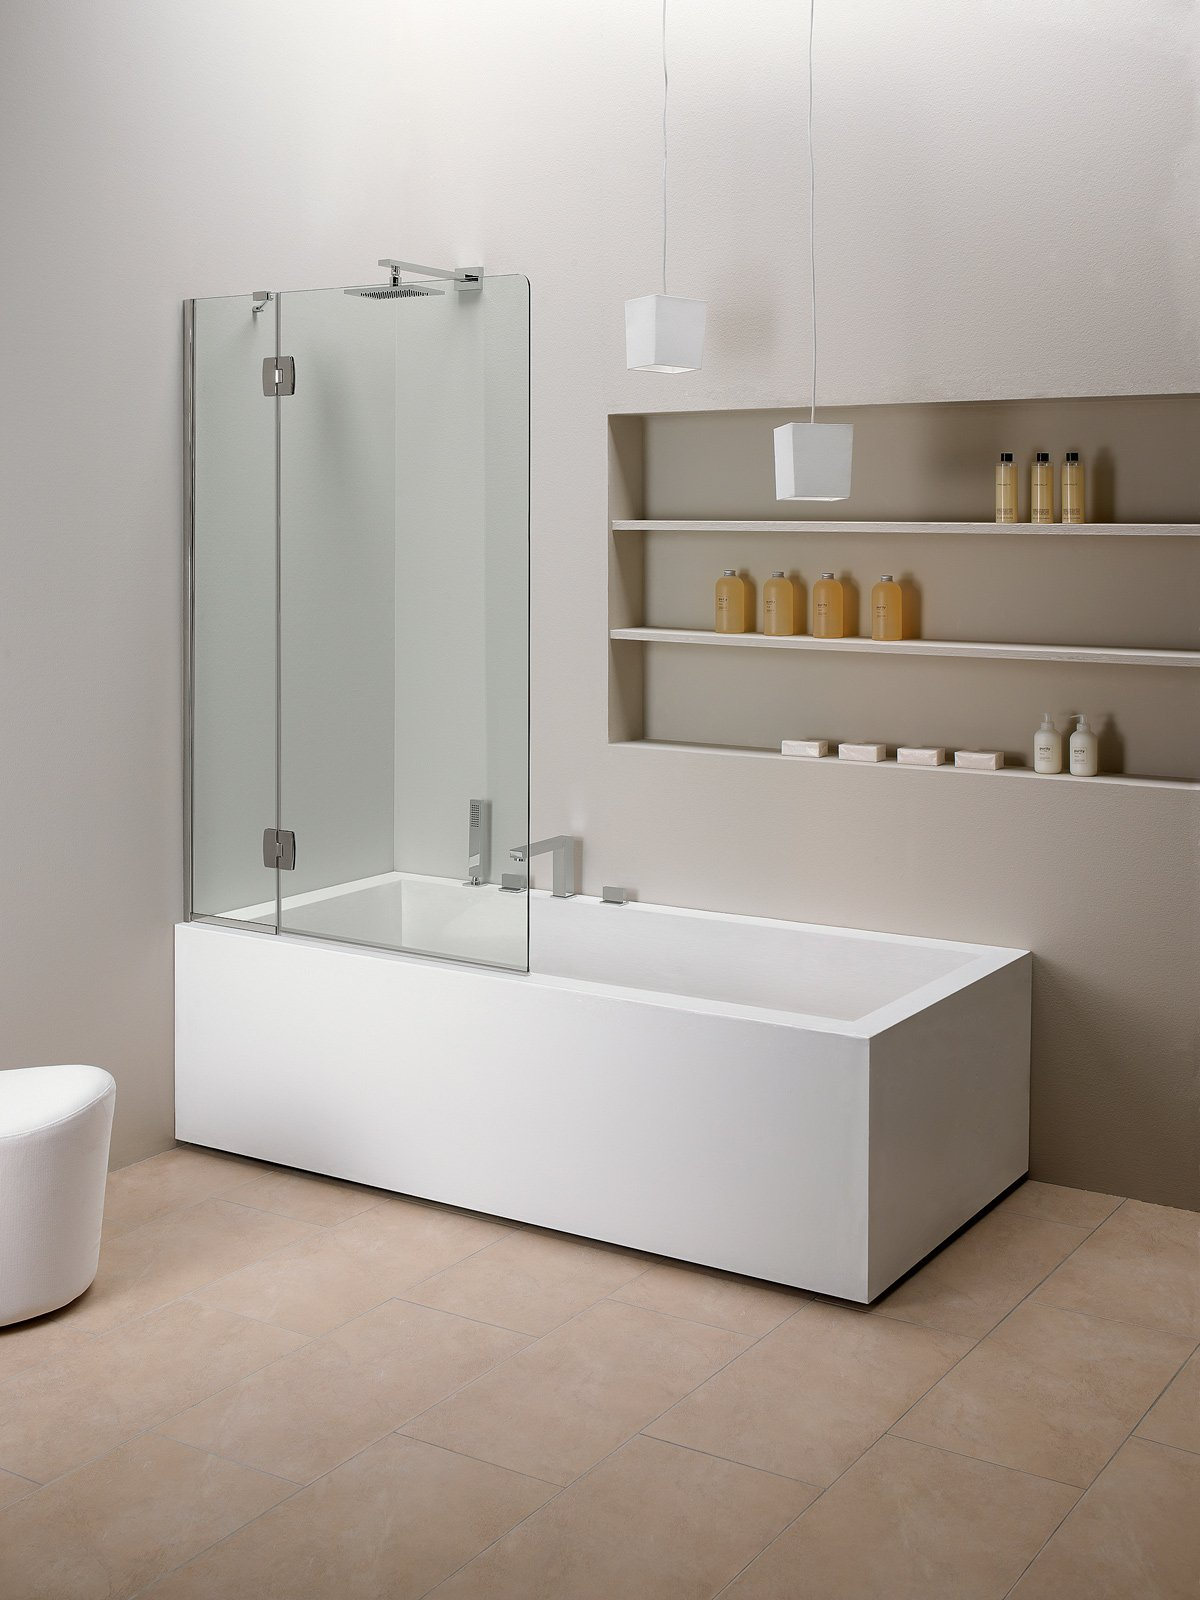 Favoloso Vasca e doccia insieme - Cose di Casa LG66